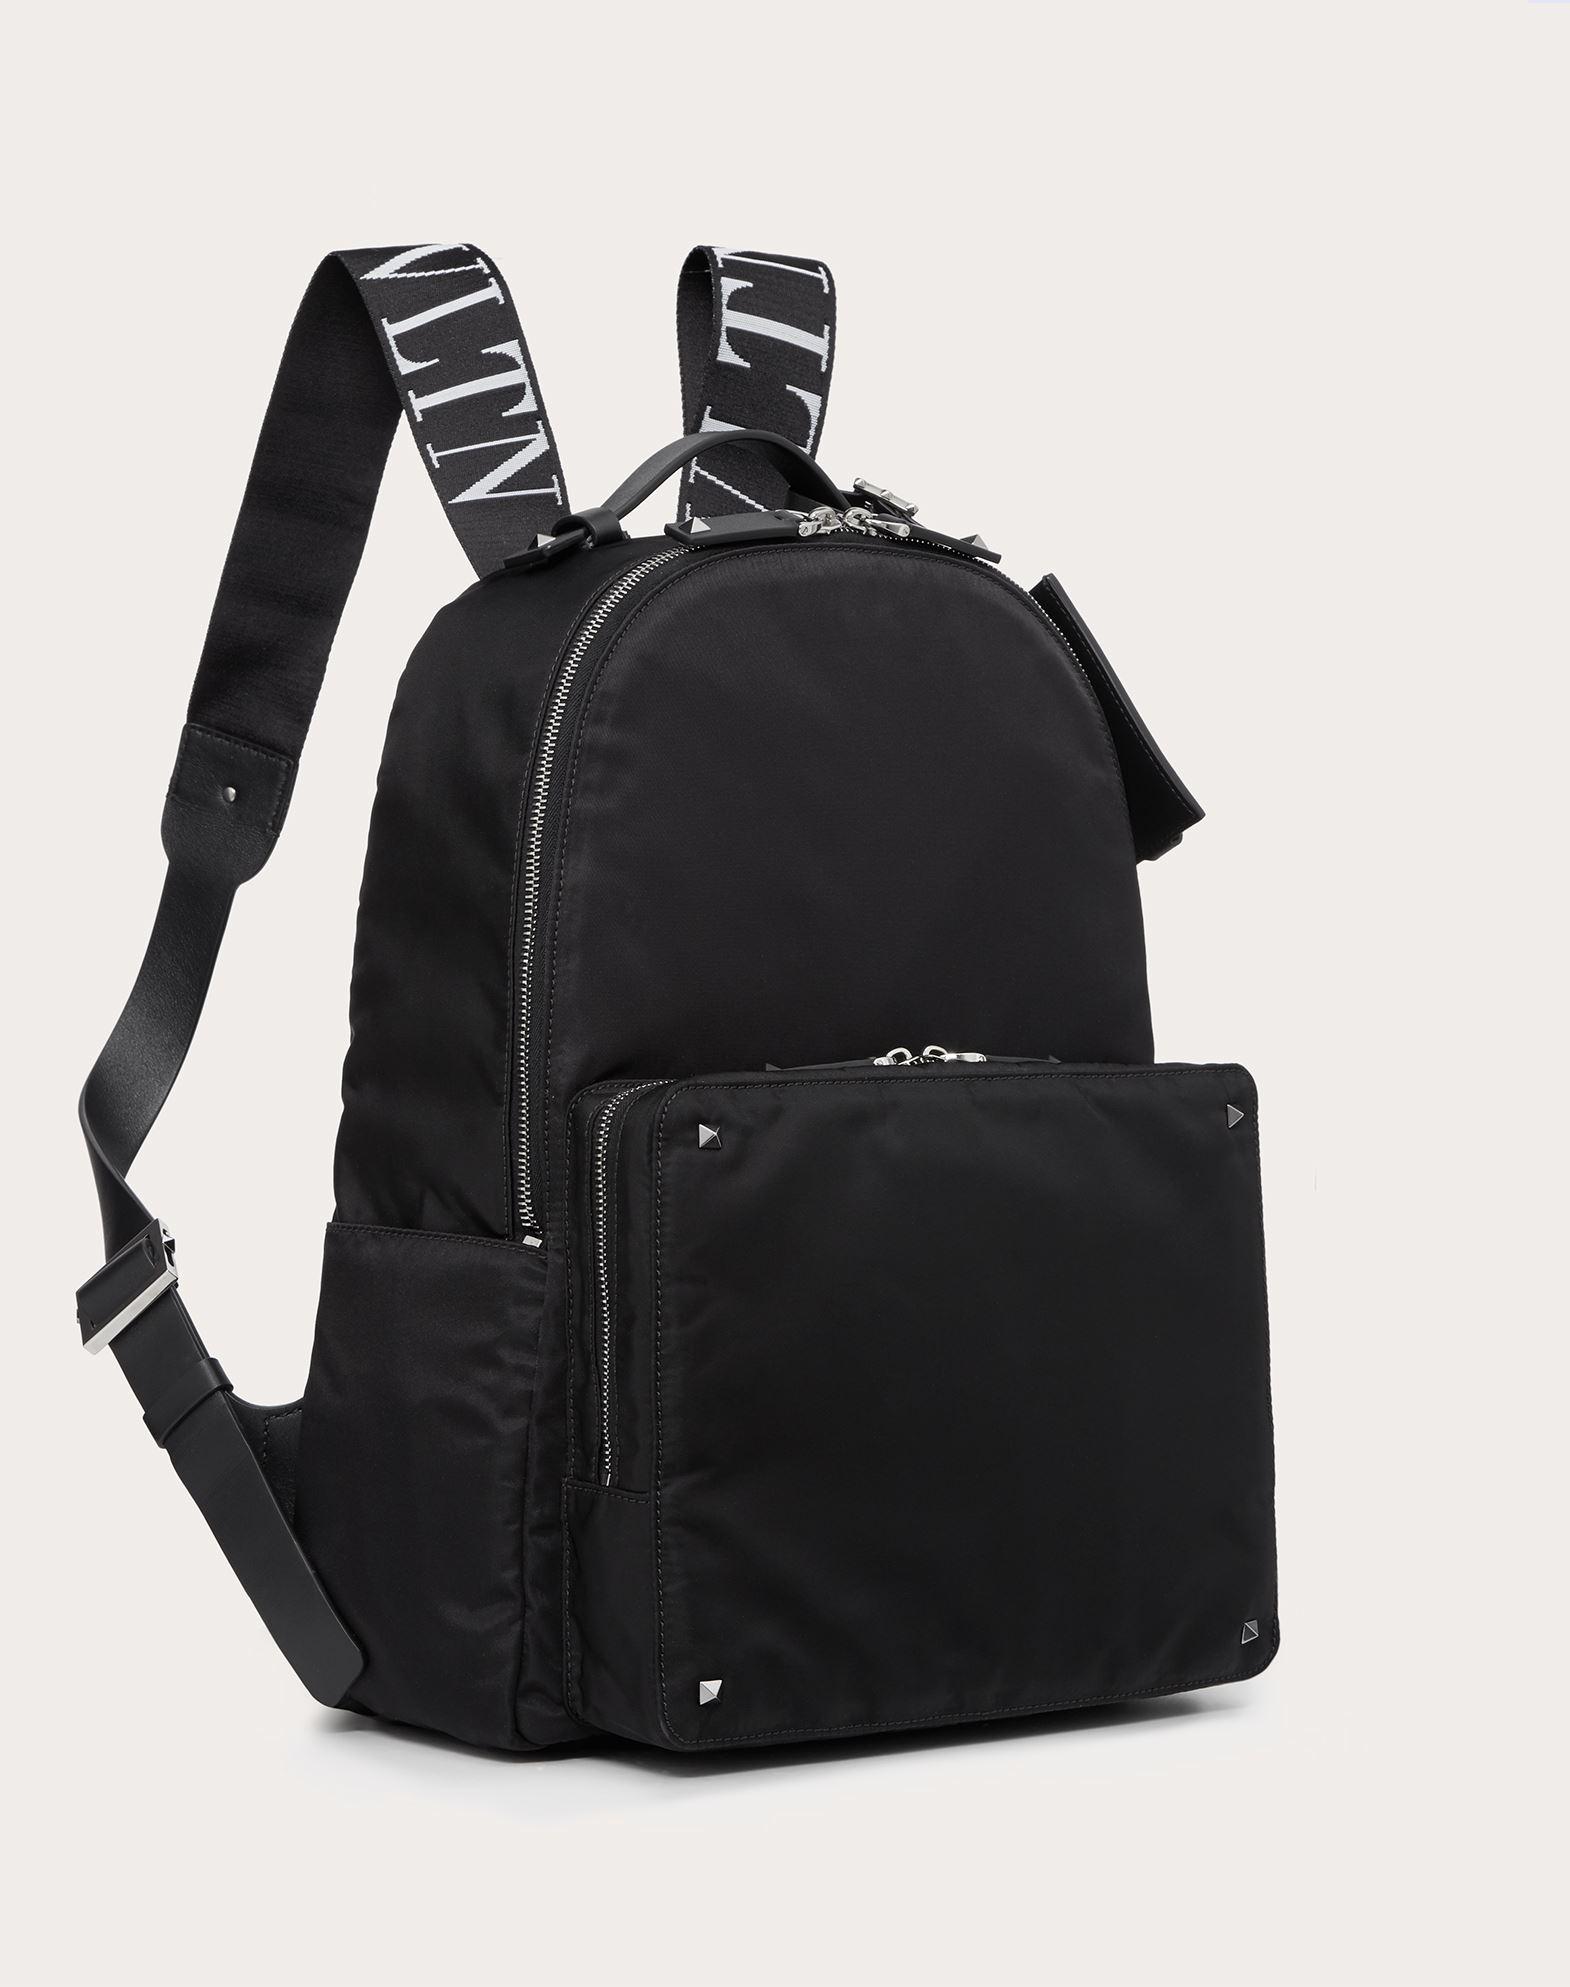 VALENTINO GARAVANI UOMO VLTN backpack Rucksack U r